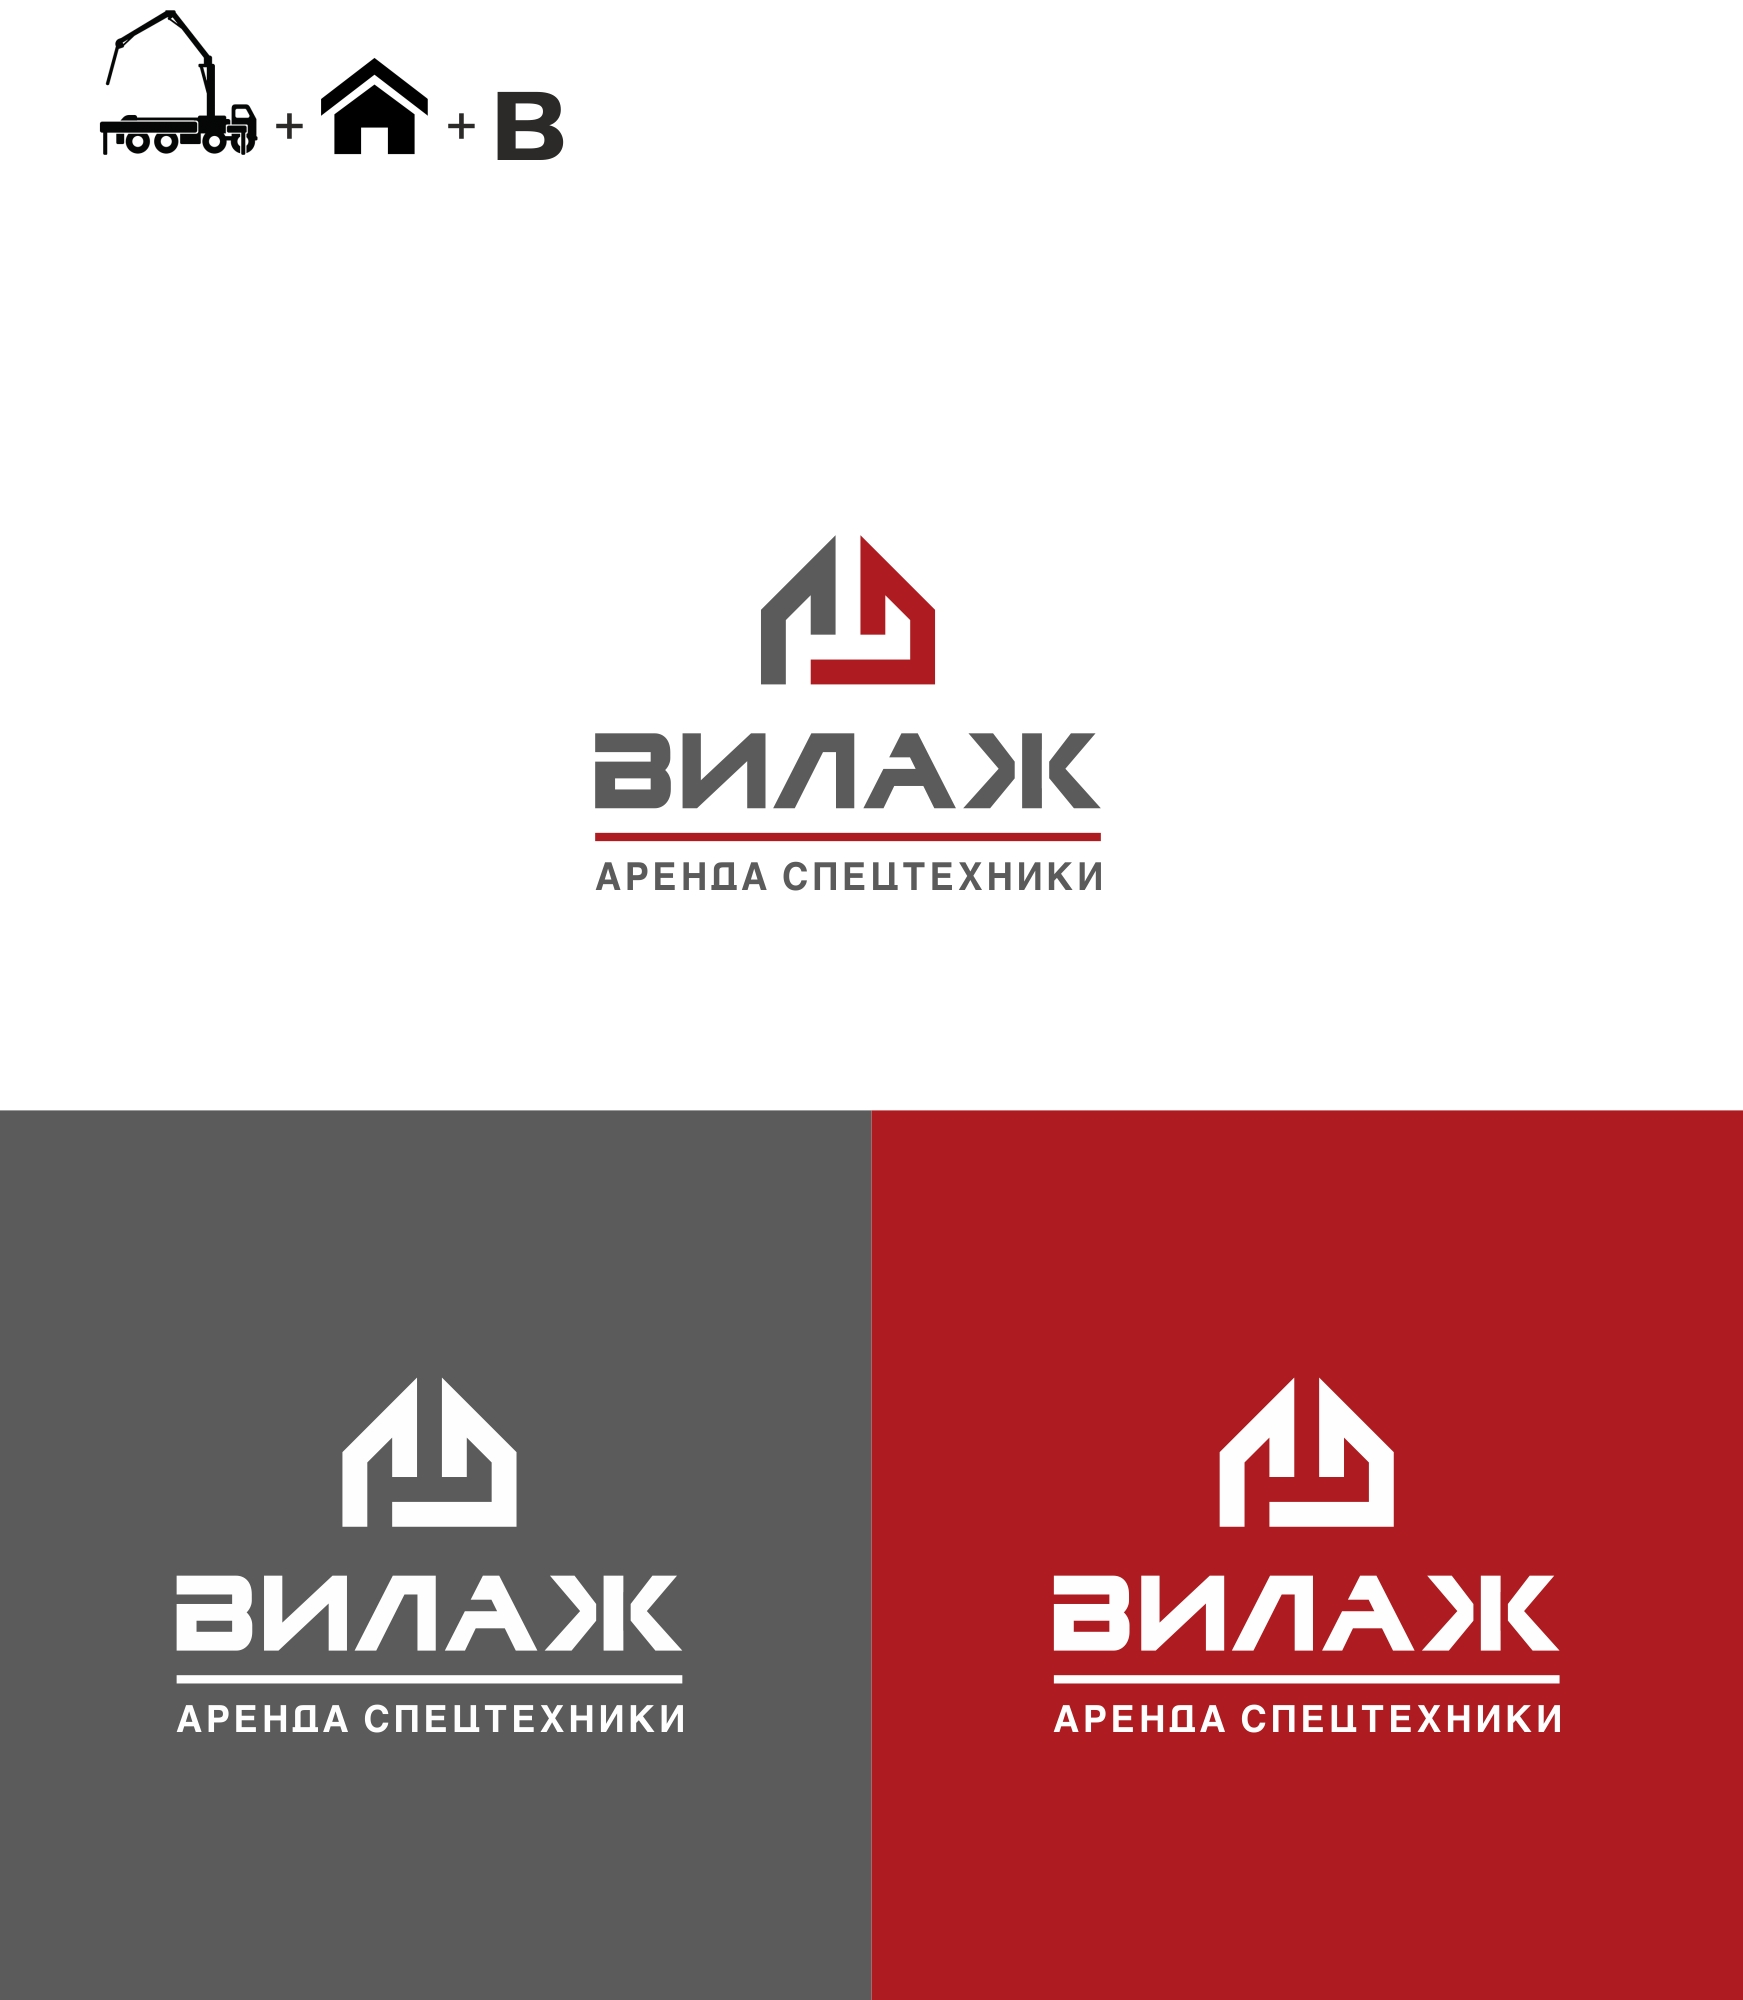 Логотип для компании по аренде спец.техники фото f_552598d70b99d4e8.jpg